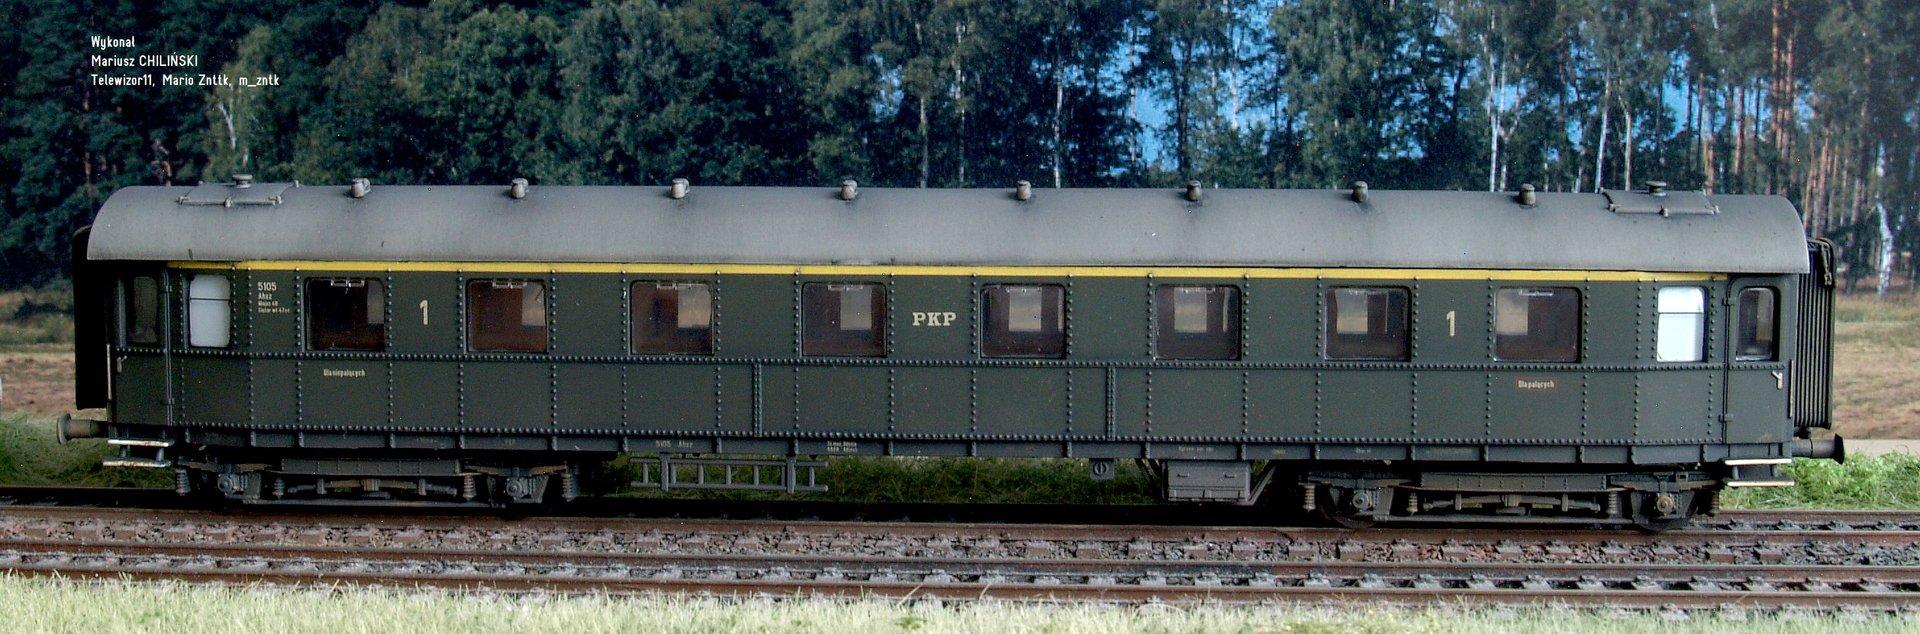 P1012482.JPG